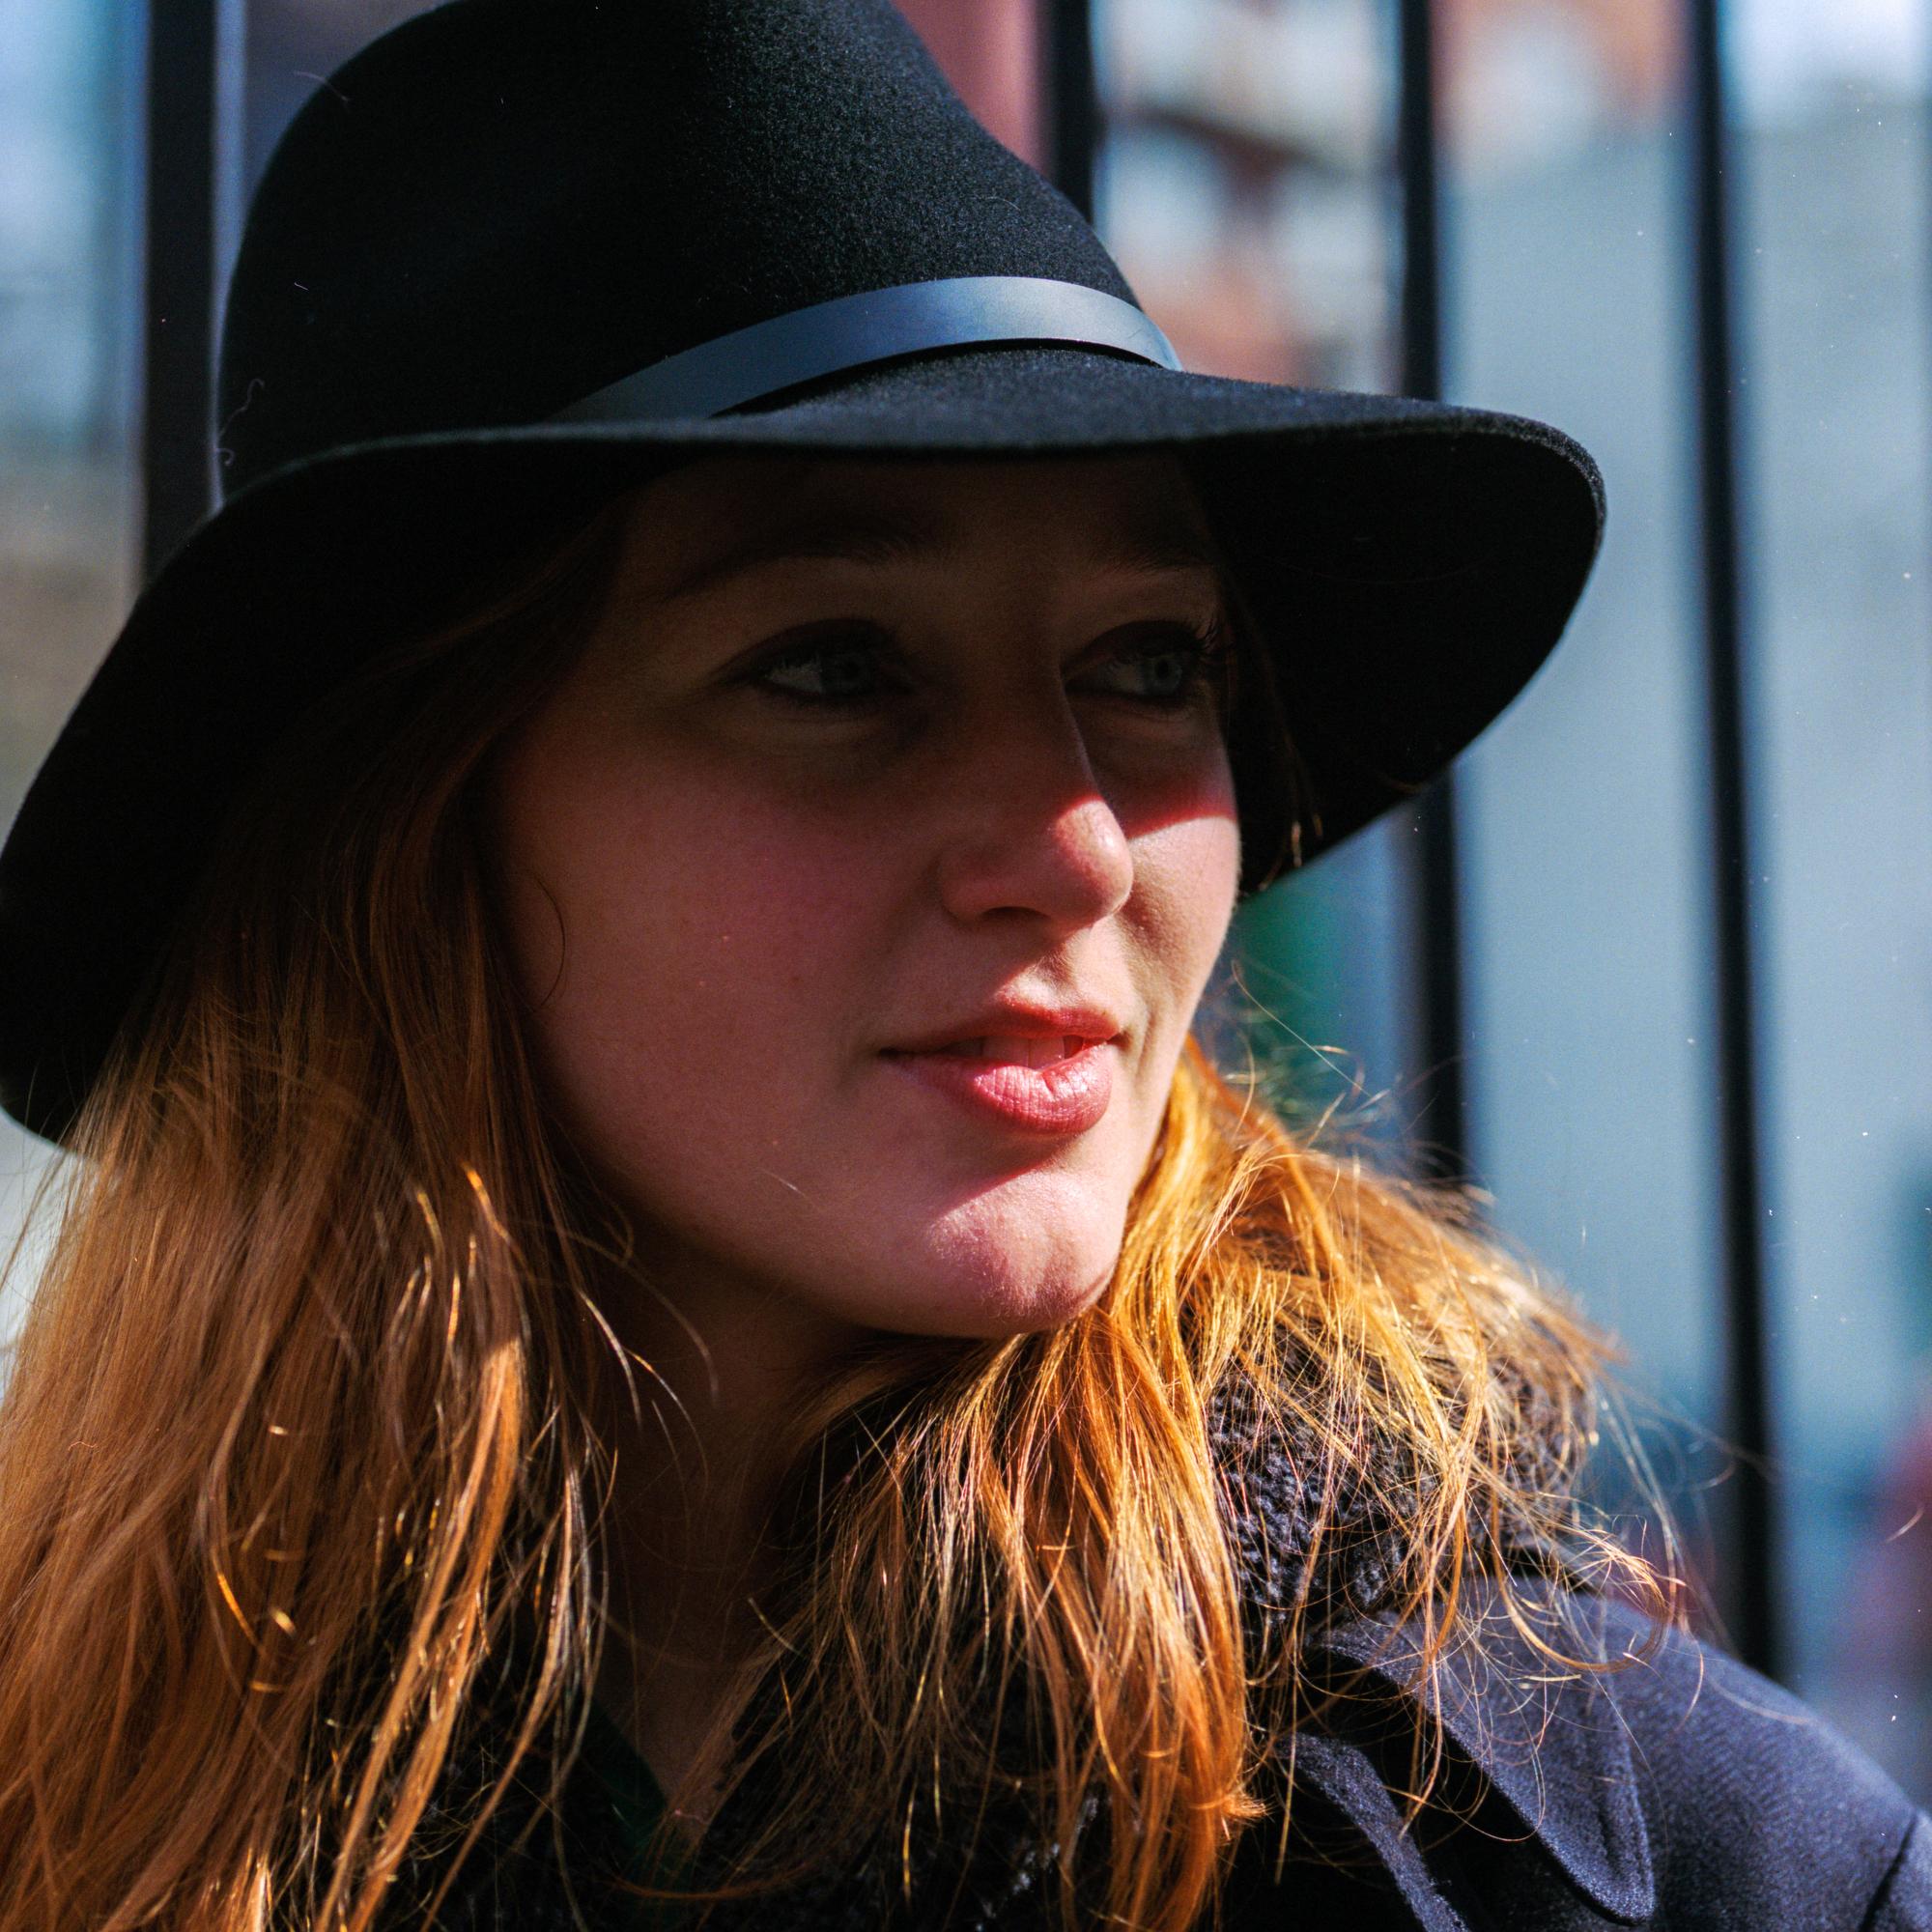 Sophie-New-York-City-6.JPG